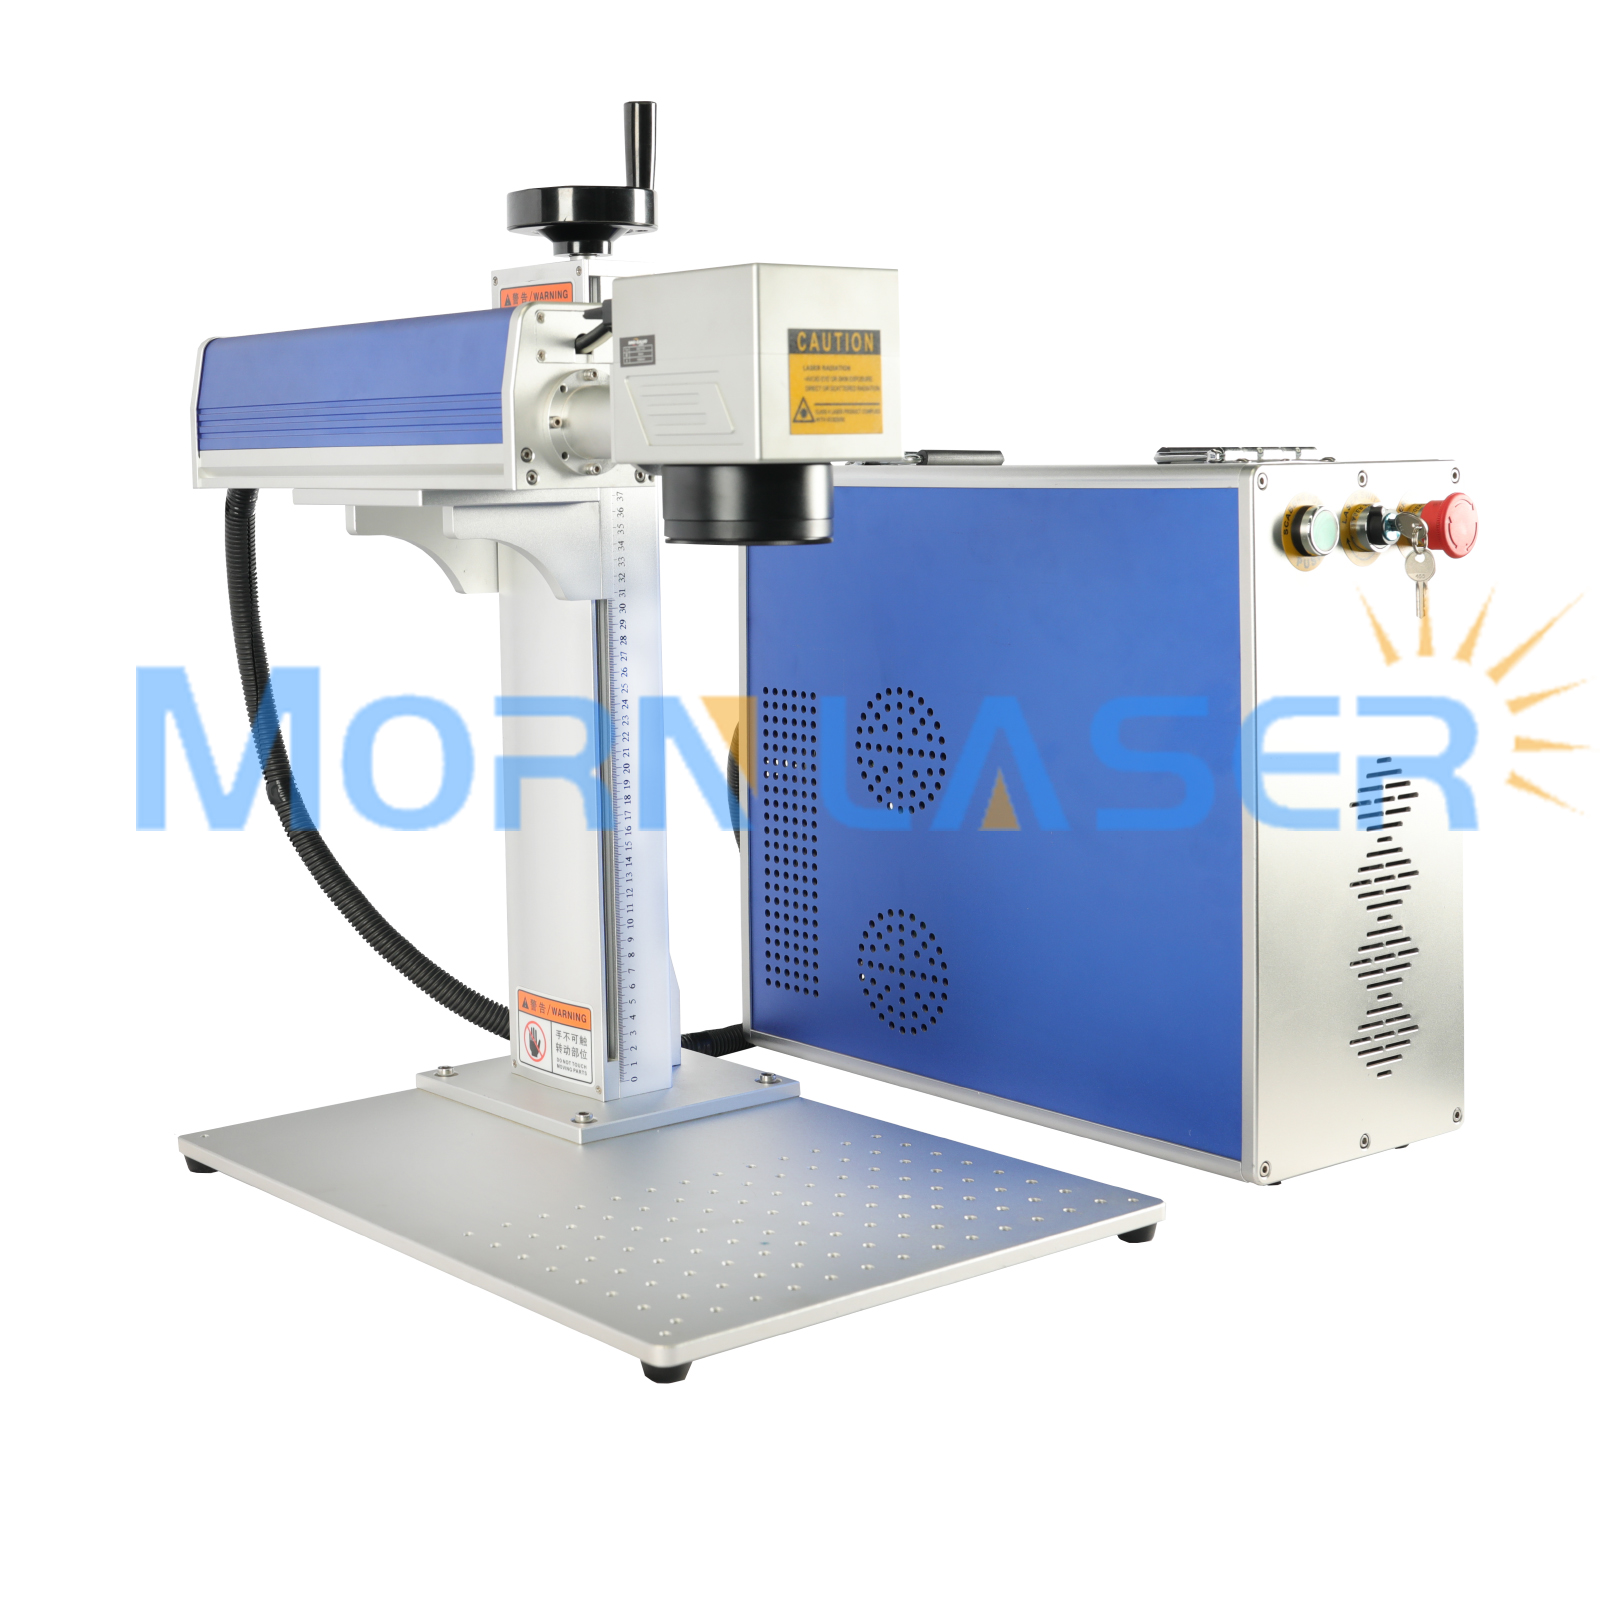 Laser Marker 30 W Raycus Fiber Laser Marking Machine For Label, Nameplate, Logo